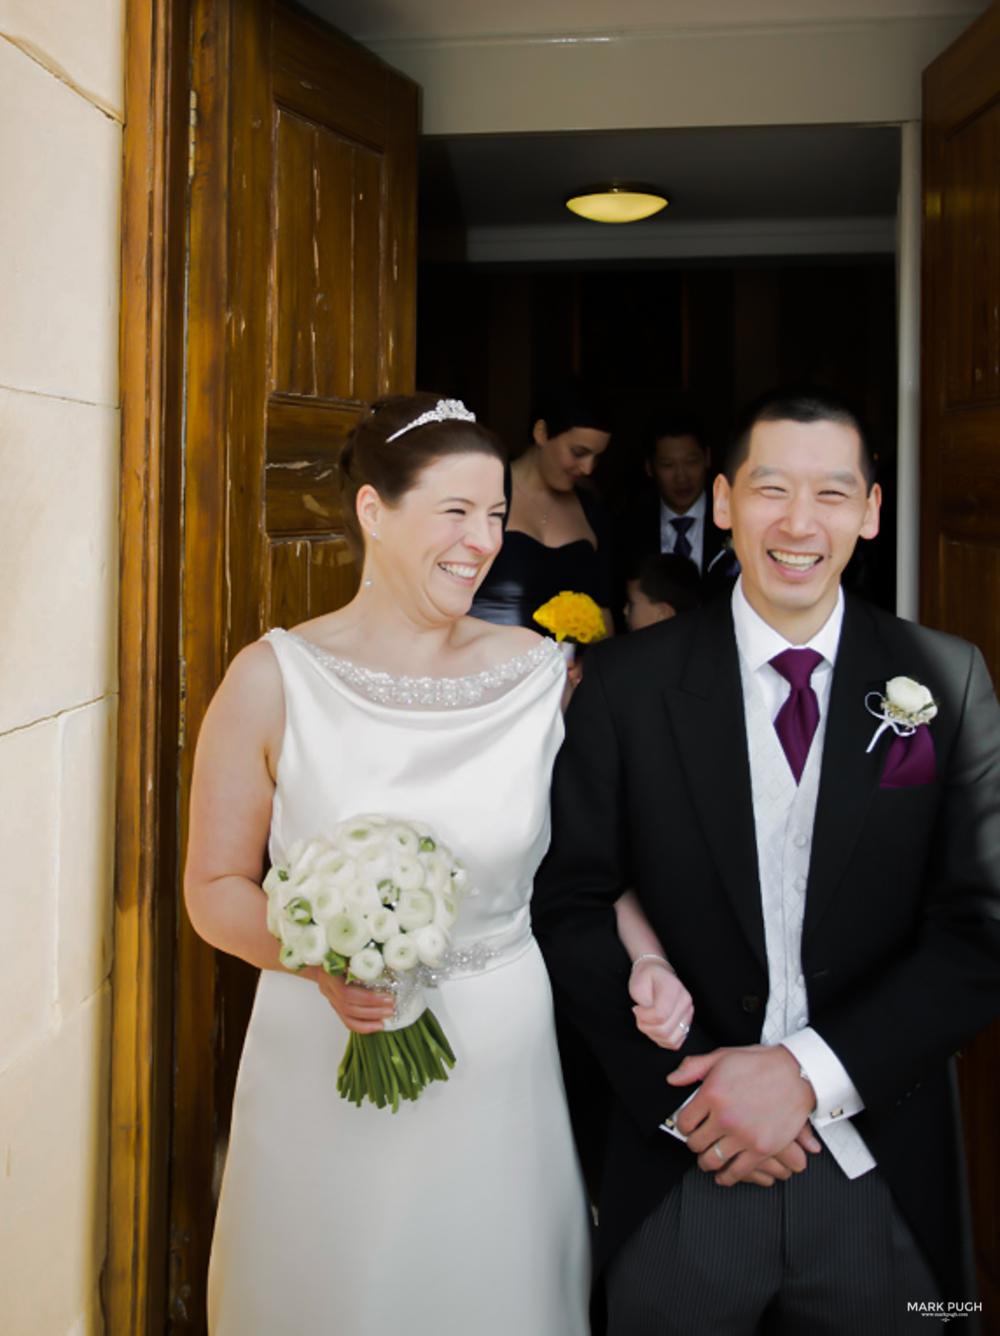 061  - Helen and Tim - Wedding Photography at Chatsworth House Bakewell Derbyshire DE45 1PP - Wedding Photographer Mark Pugh www.markpugh.com -131.JPG